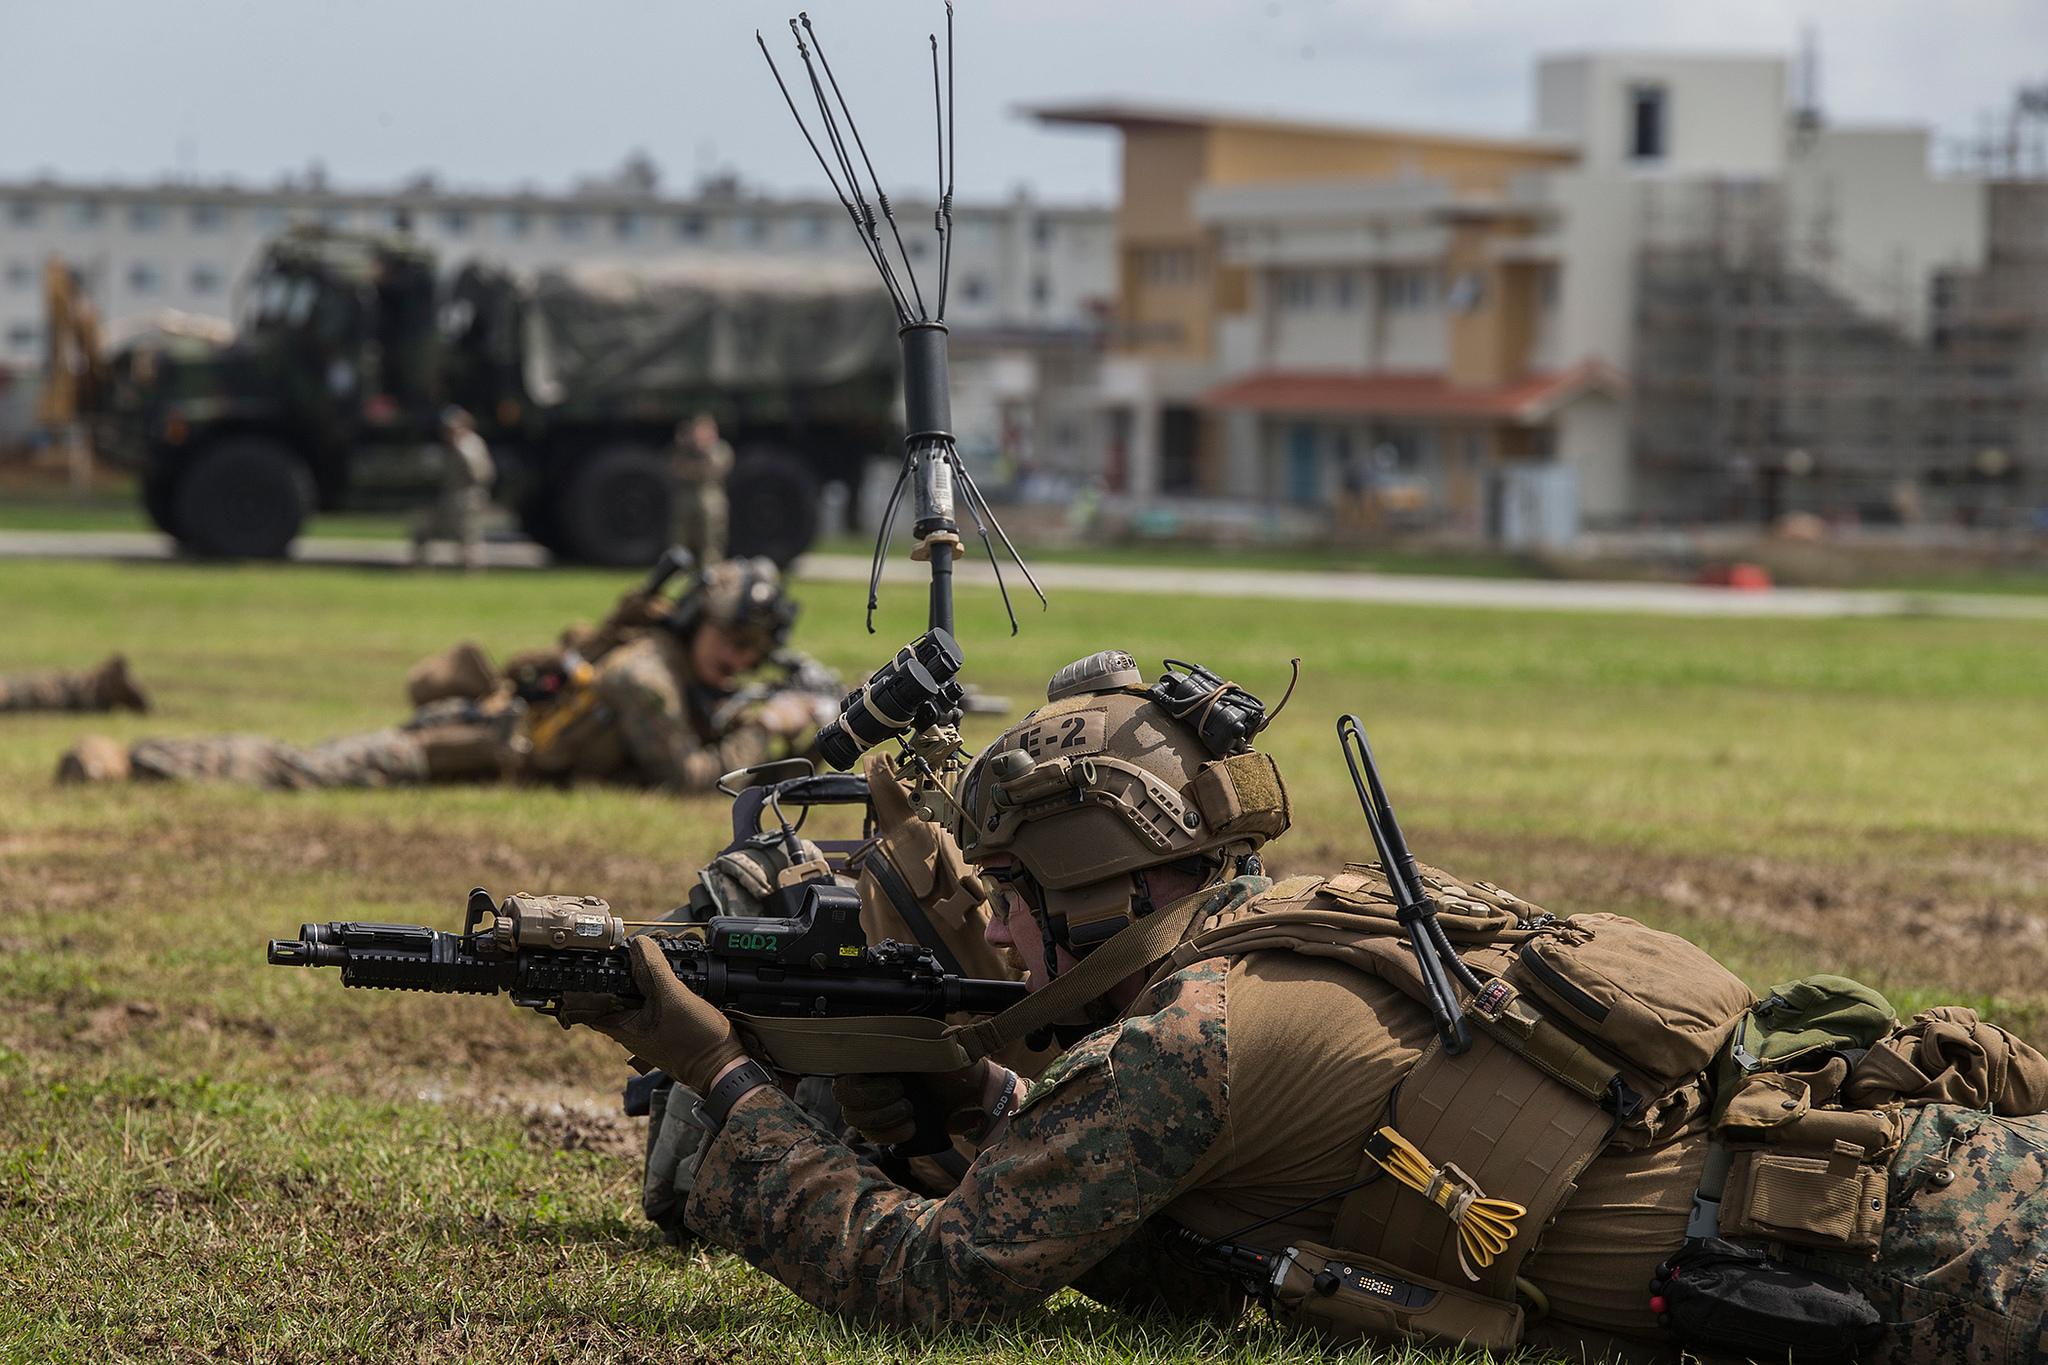 Marines post security during a simulated raid at Camp Hansen, Okinawa, Japan, Feb. 25, 2019. (Lance Cpl. Kyle P. Bunyi/Marine Corps)